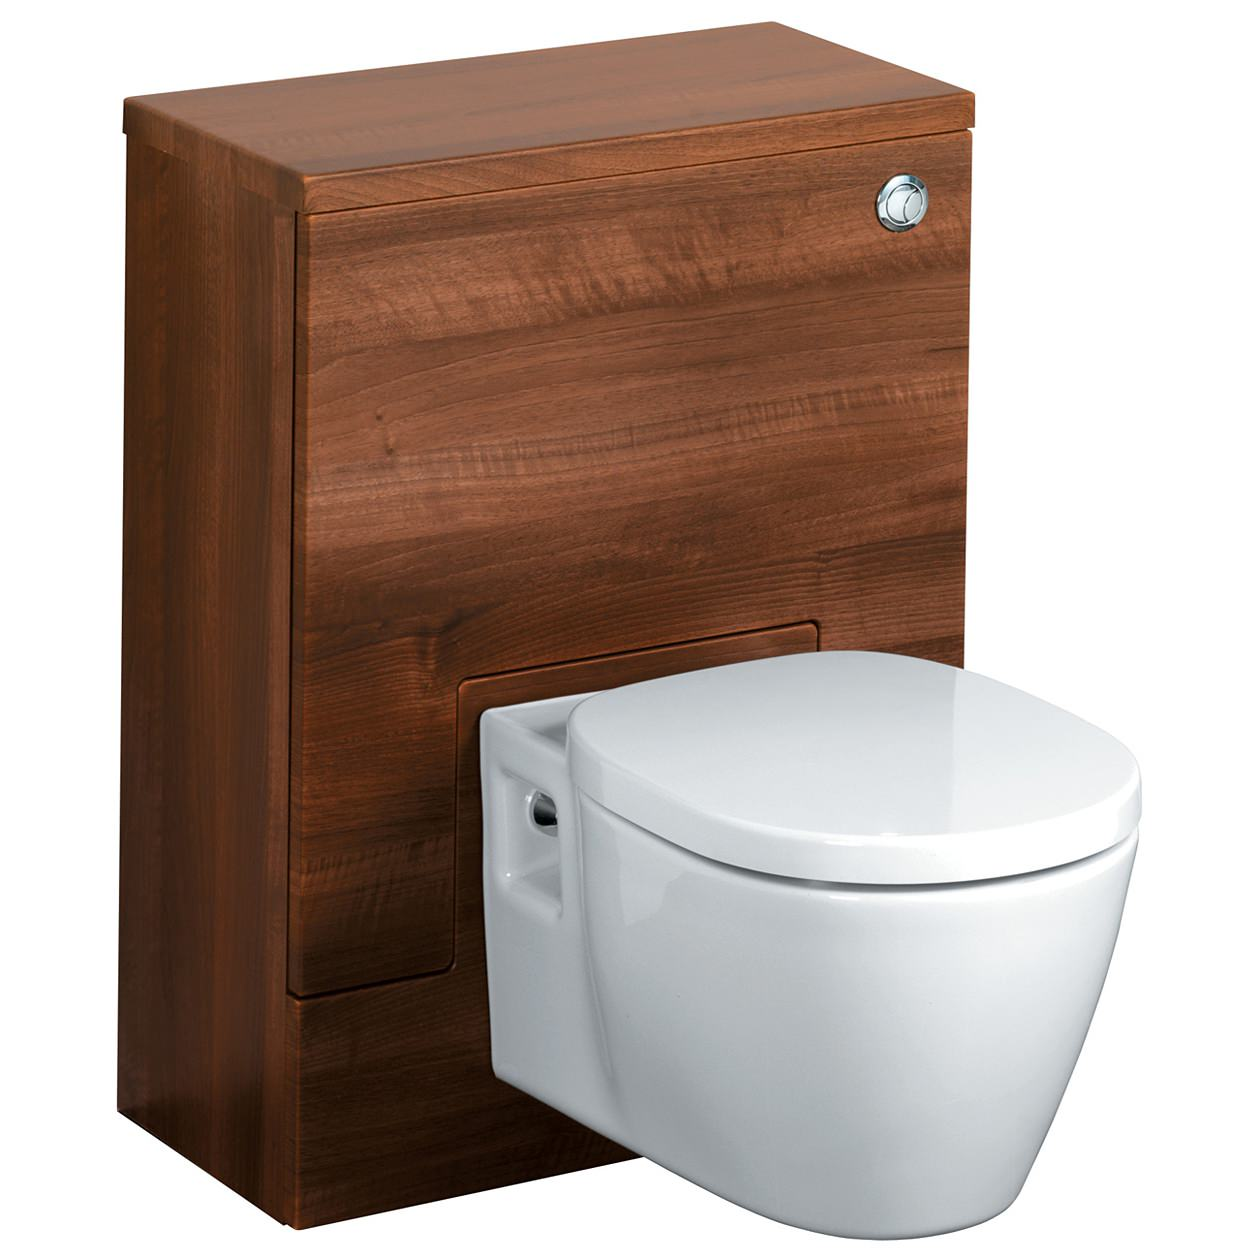 ideal standard concept 600 x 300mm wc unit american oak. Black Bedroom Furniture Sets. Home Design Ideas